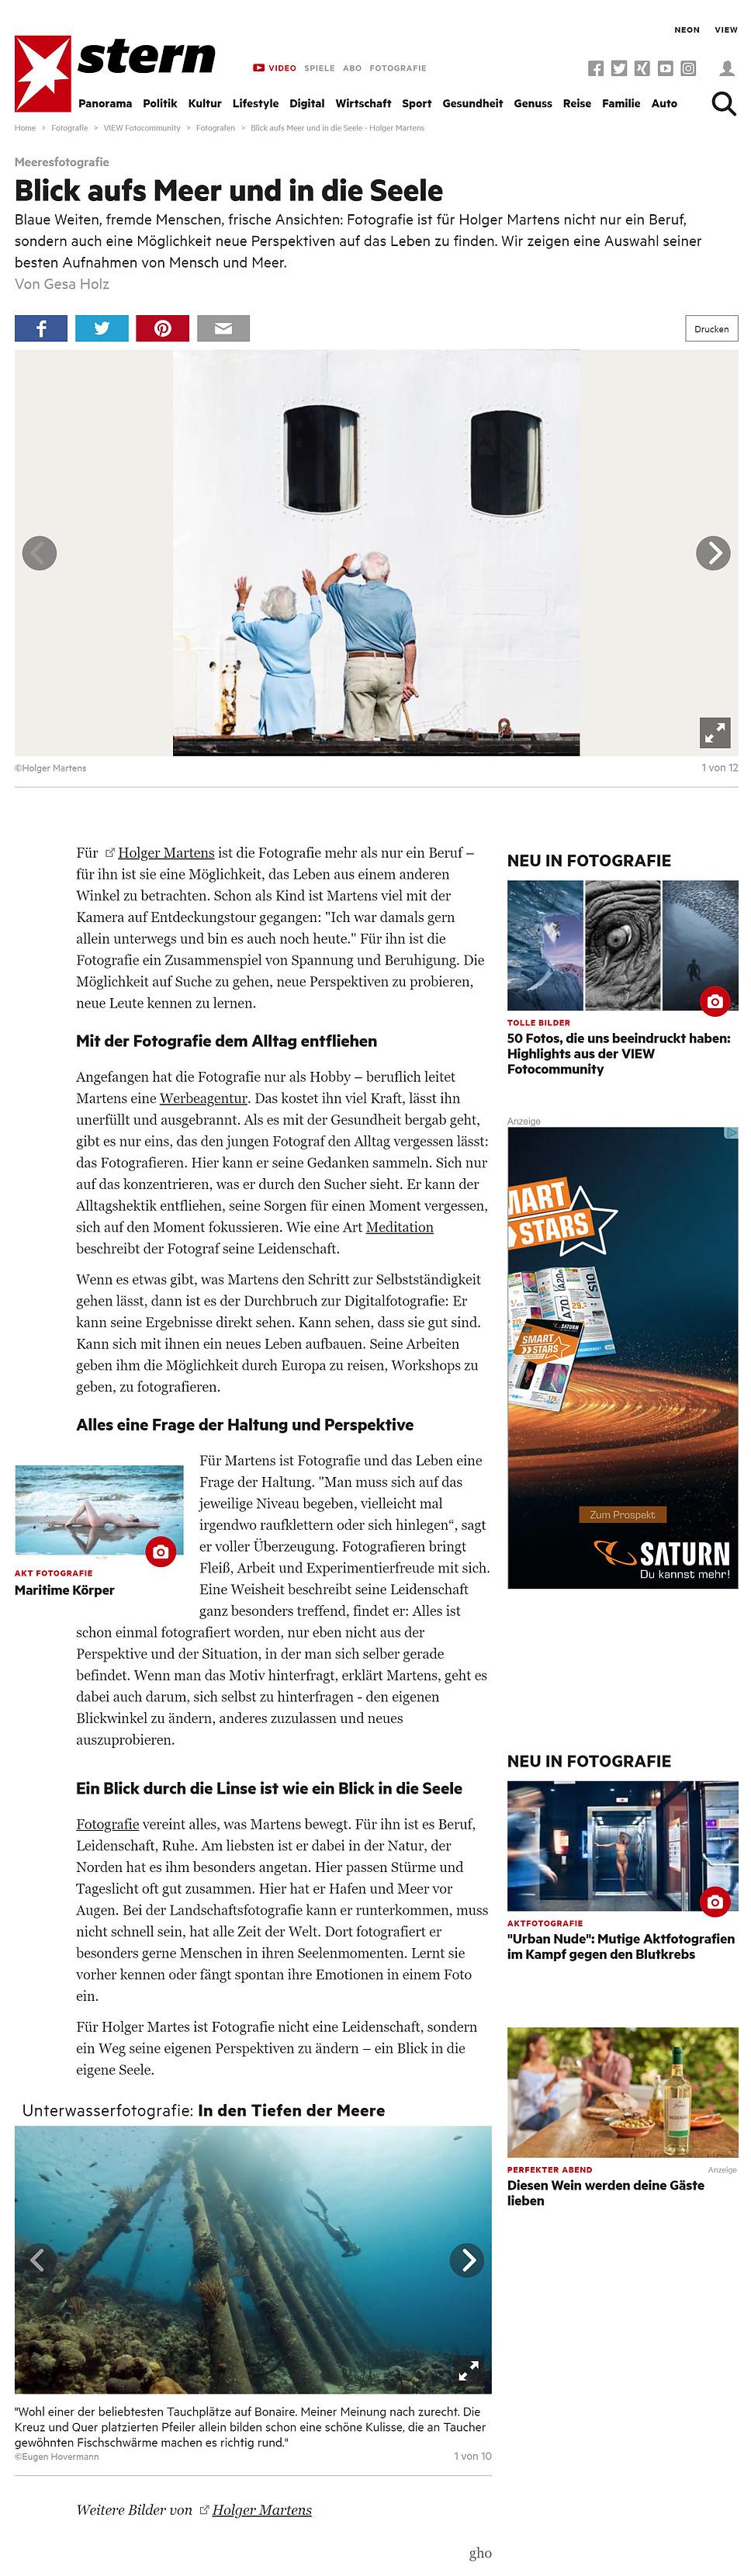 holger-martens-im-interview-magazin-ster